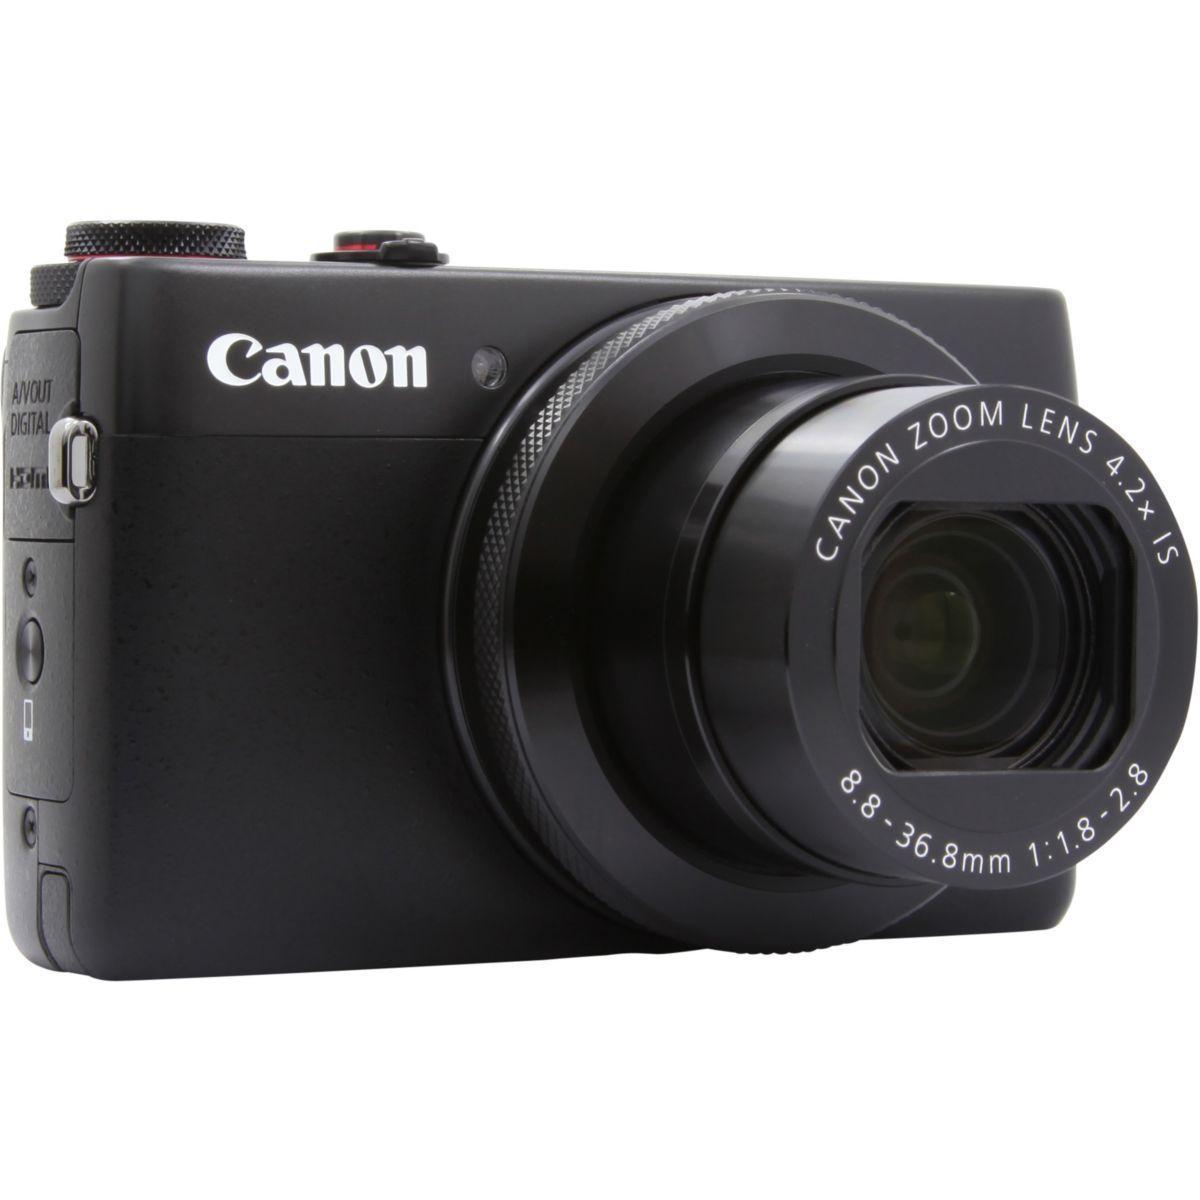 Compact - Canon PowerShot G7X Noir Canon Canon Zoom Lens 4.2x IS 24–100mm f/1.8–2.8